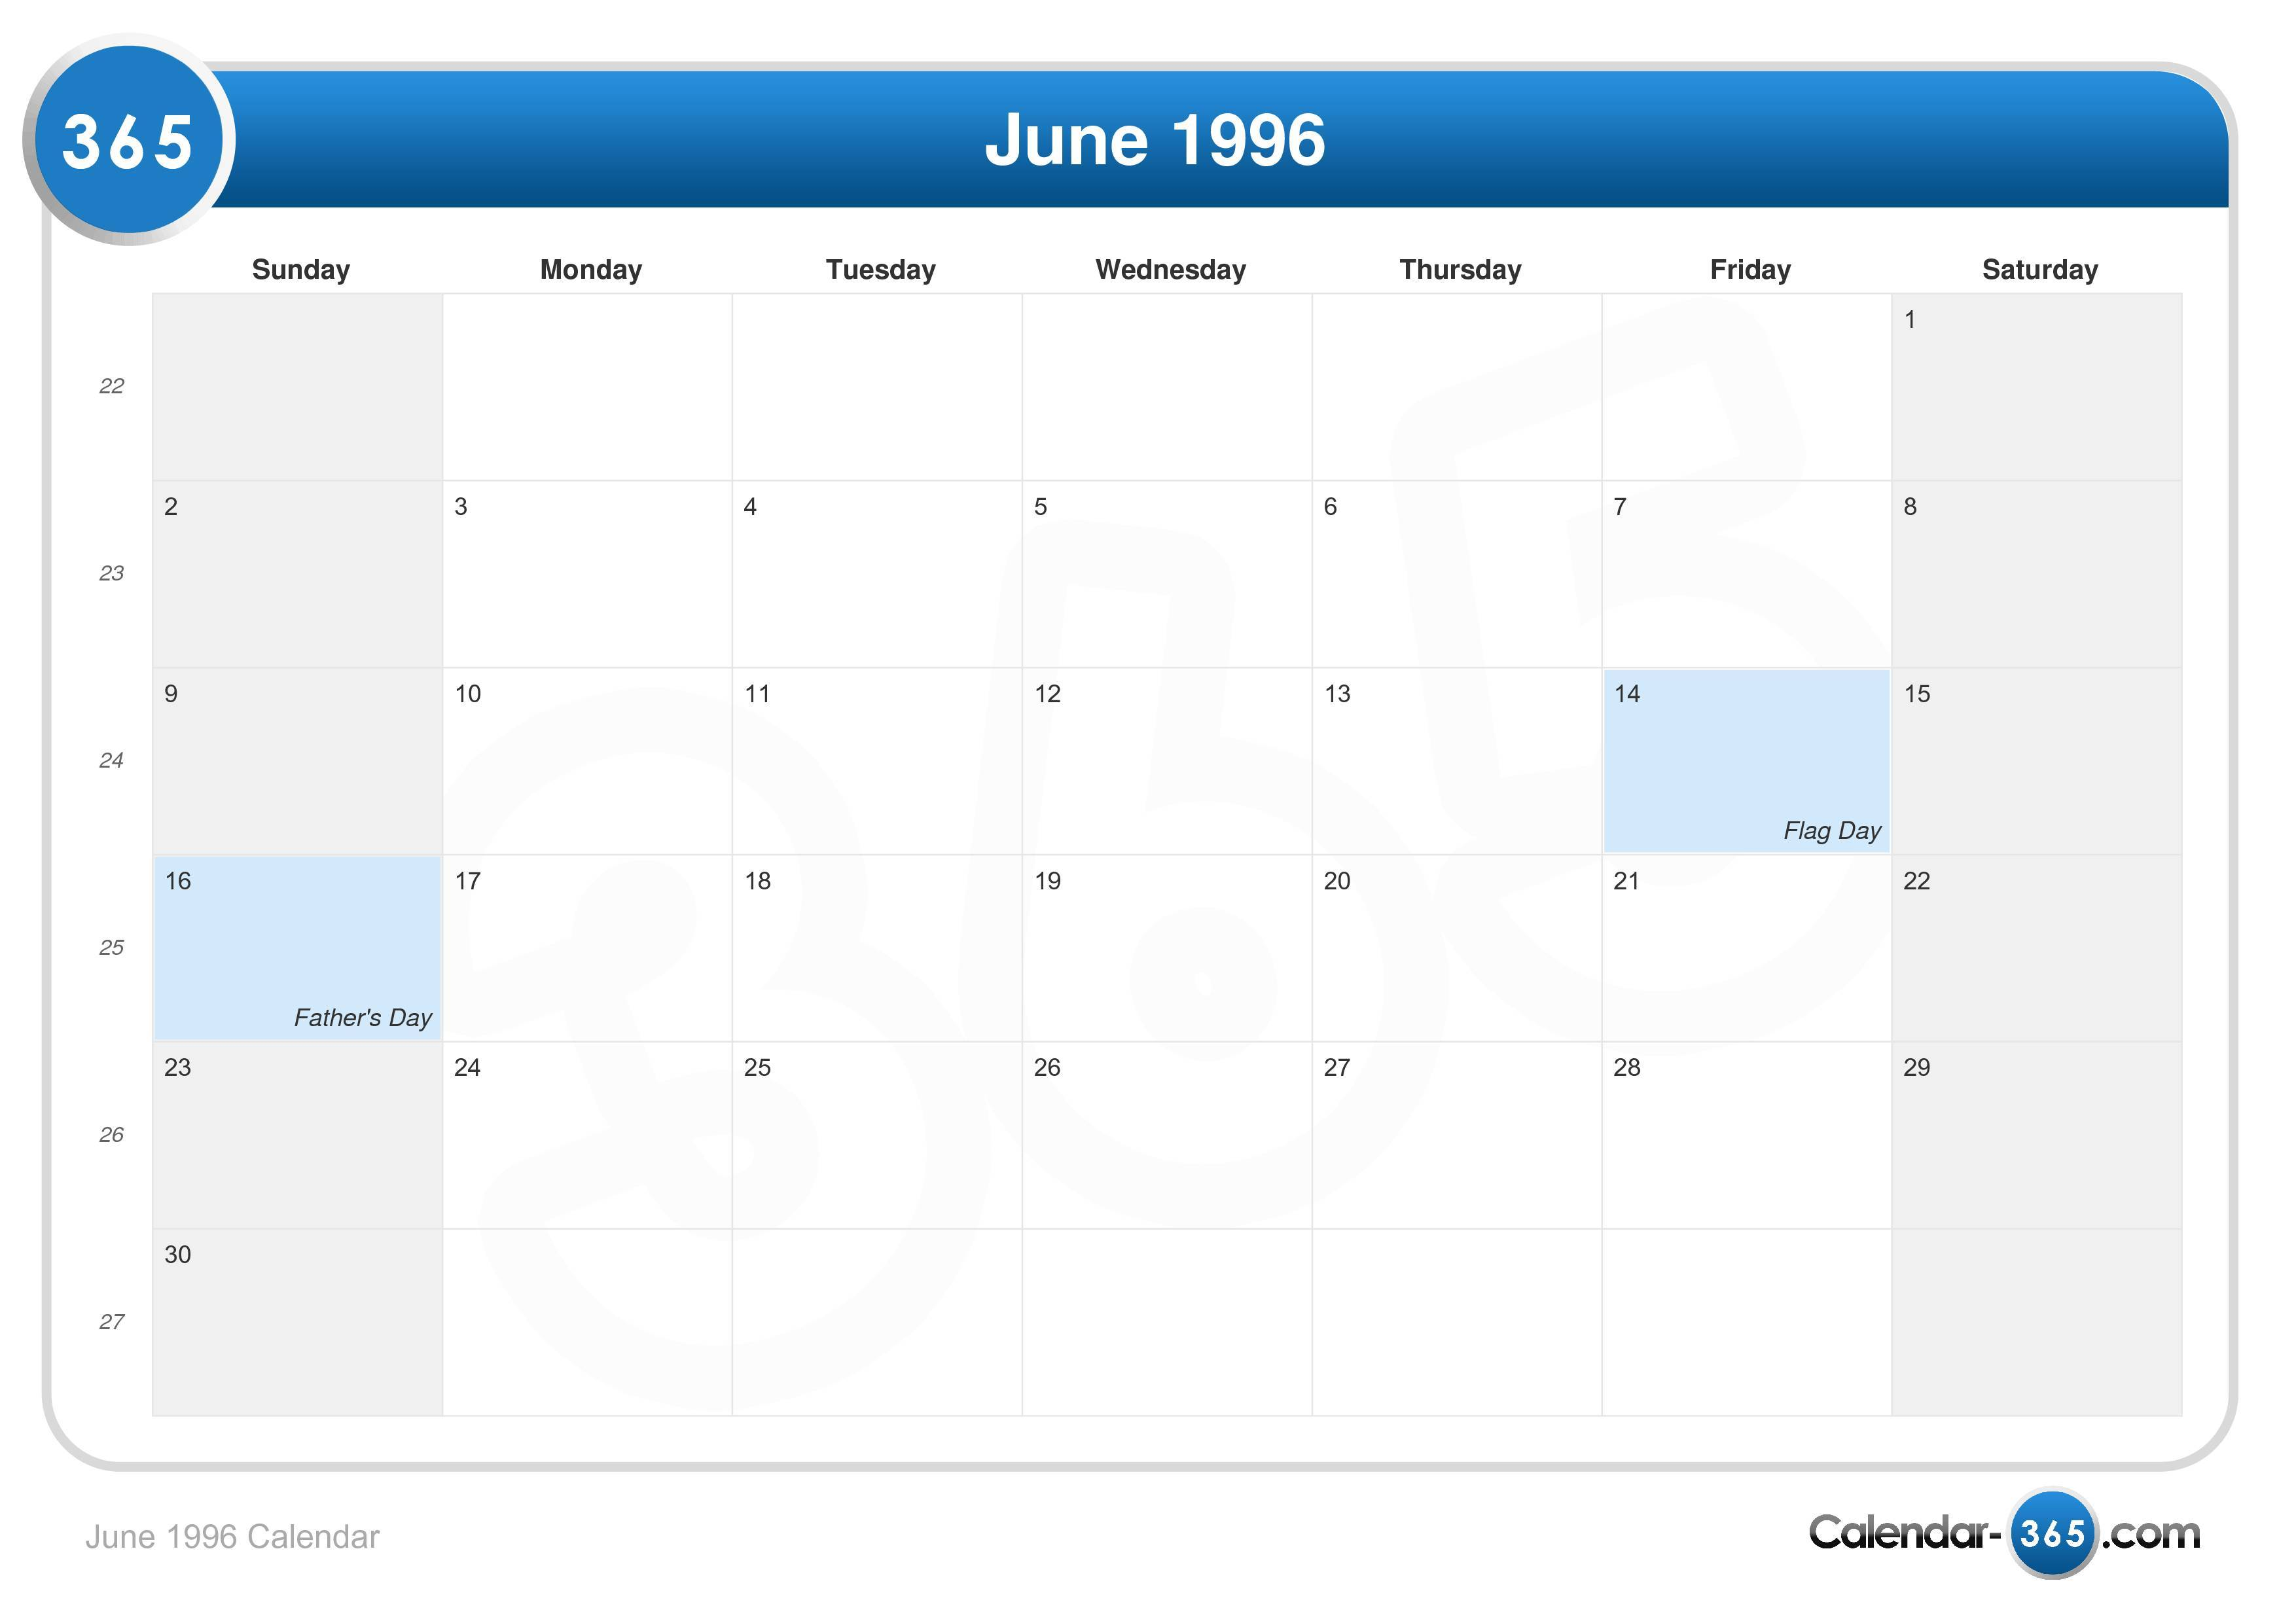 June 1996 Calendar